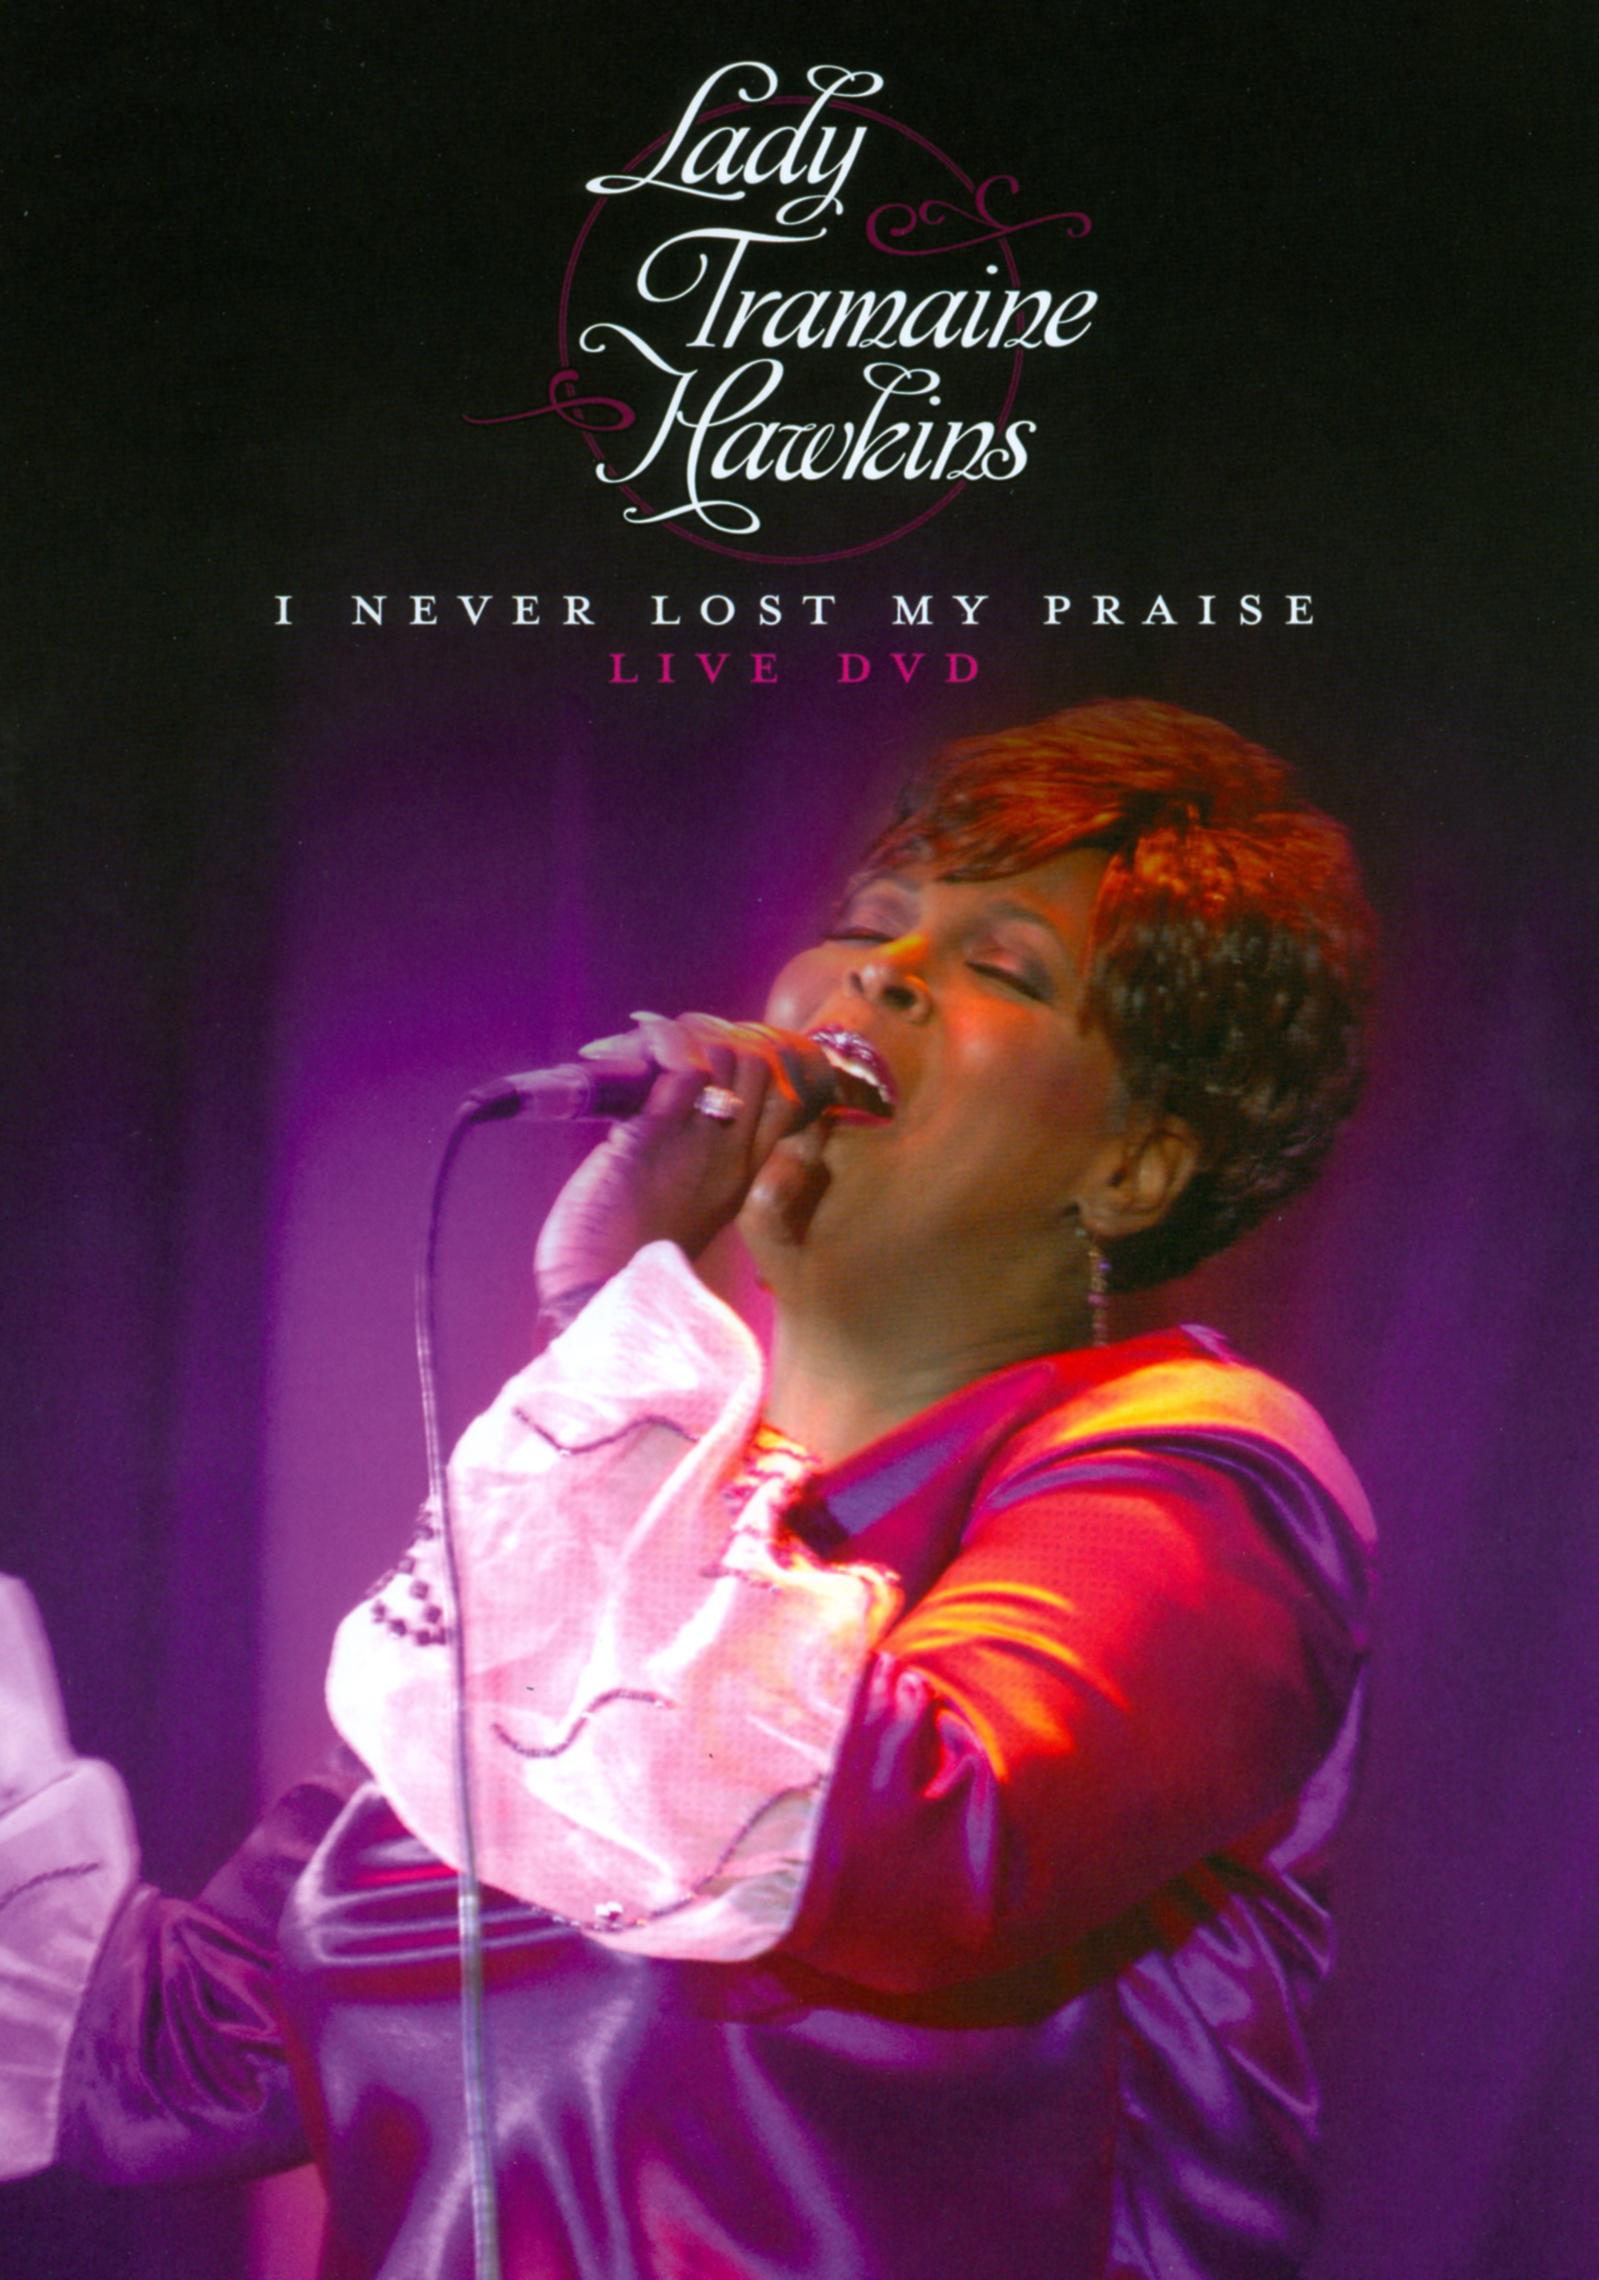 Lady Tramaine Hawkins: I Never Lost My Praise